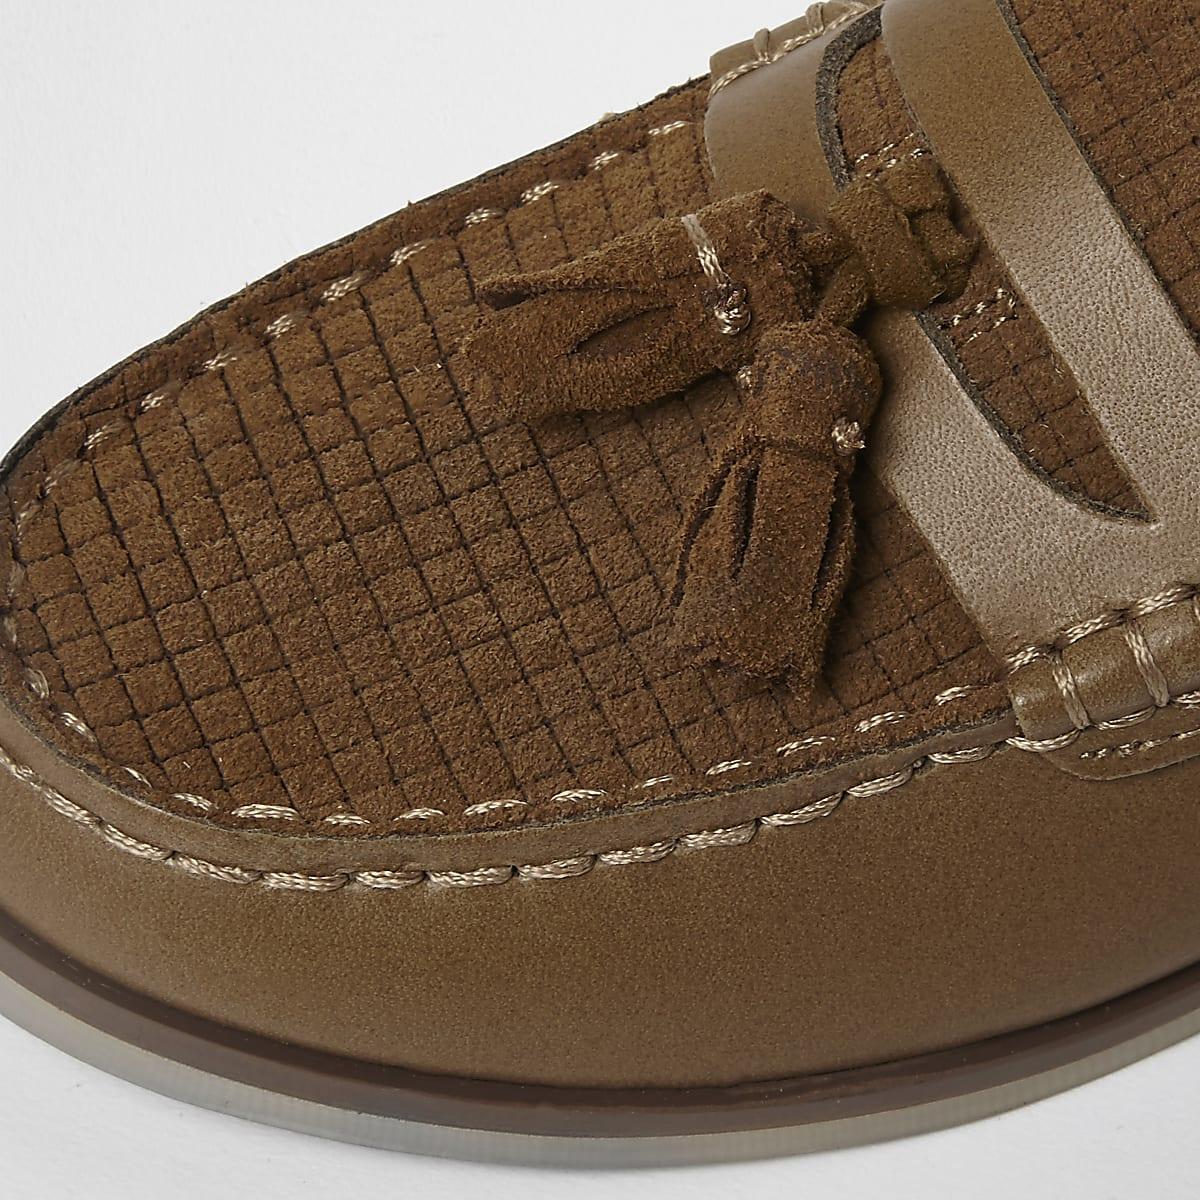 5de9a24da83 Boys tan leather and suede tassel loafers - Shoes - Footwear - boys